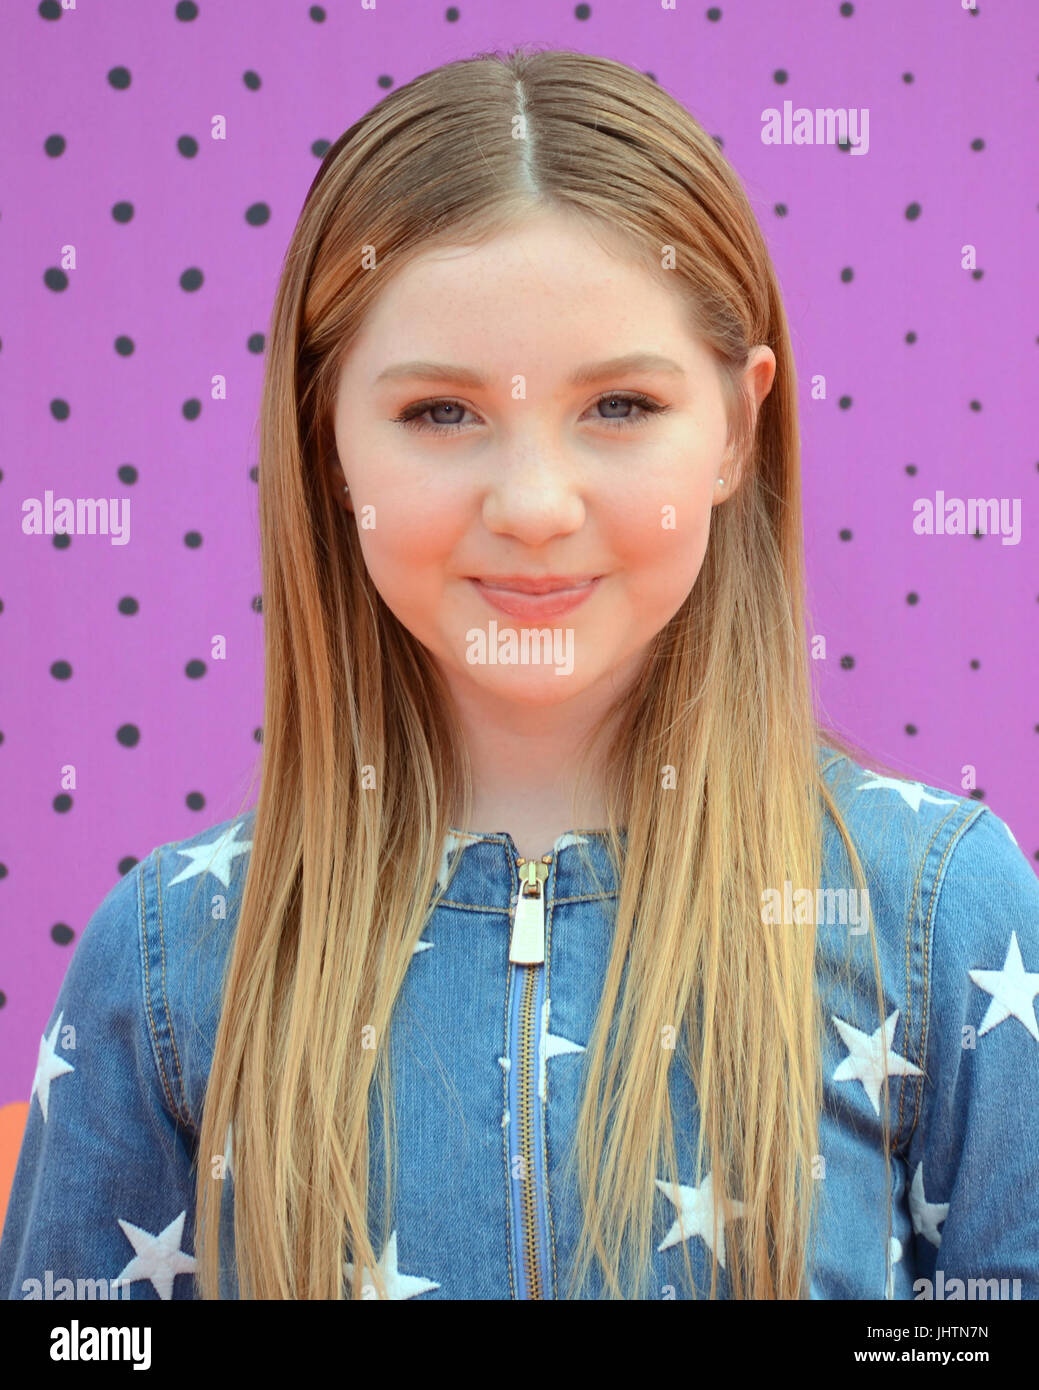 Ella Anderson attends 2017 Nickelodeon Kids' Choice Sports Awards Pauley Pavilion Los Angeles,California July 13,2017. Stock Photo